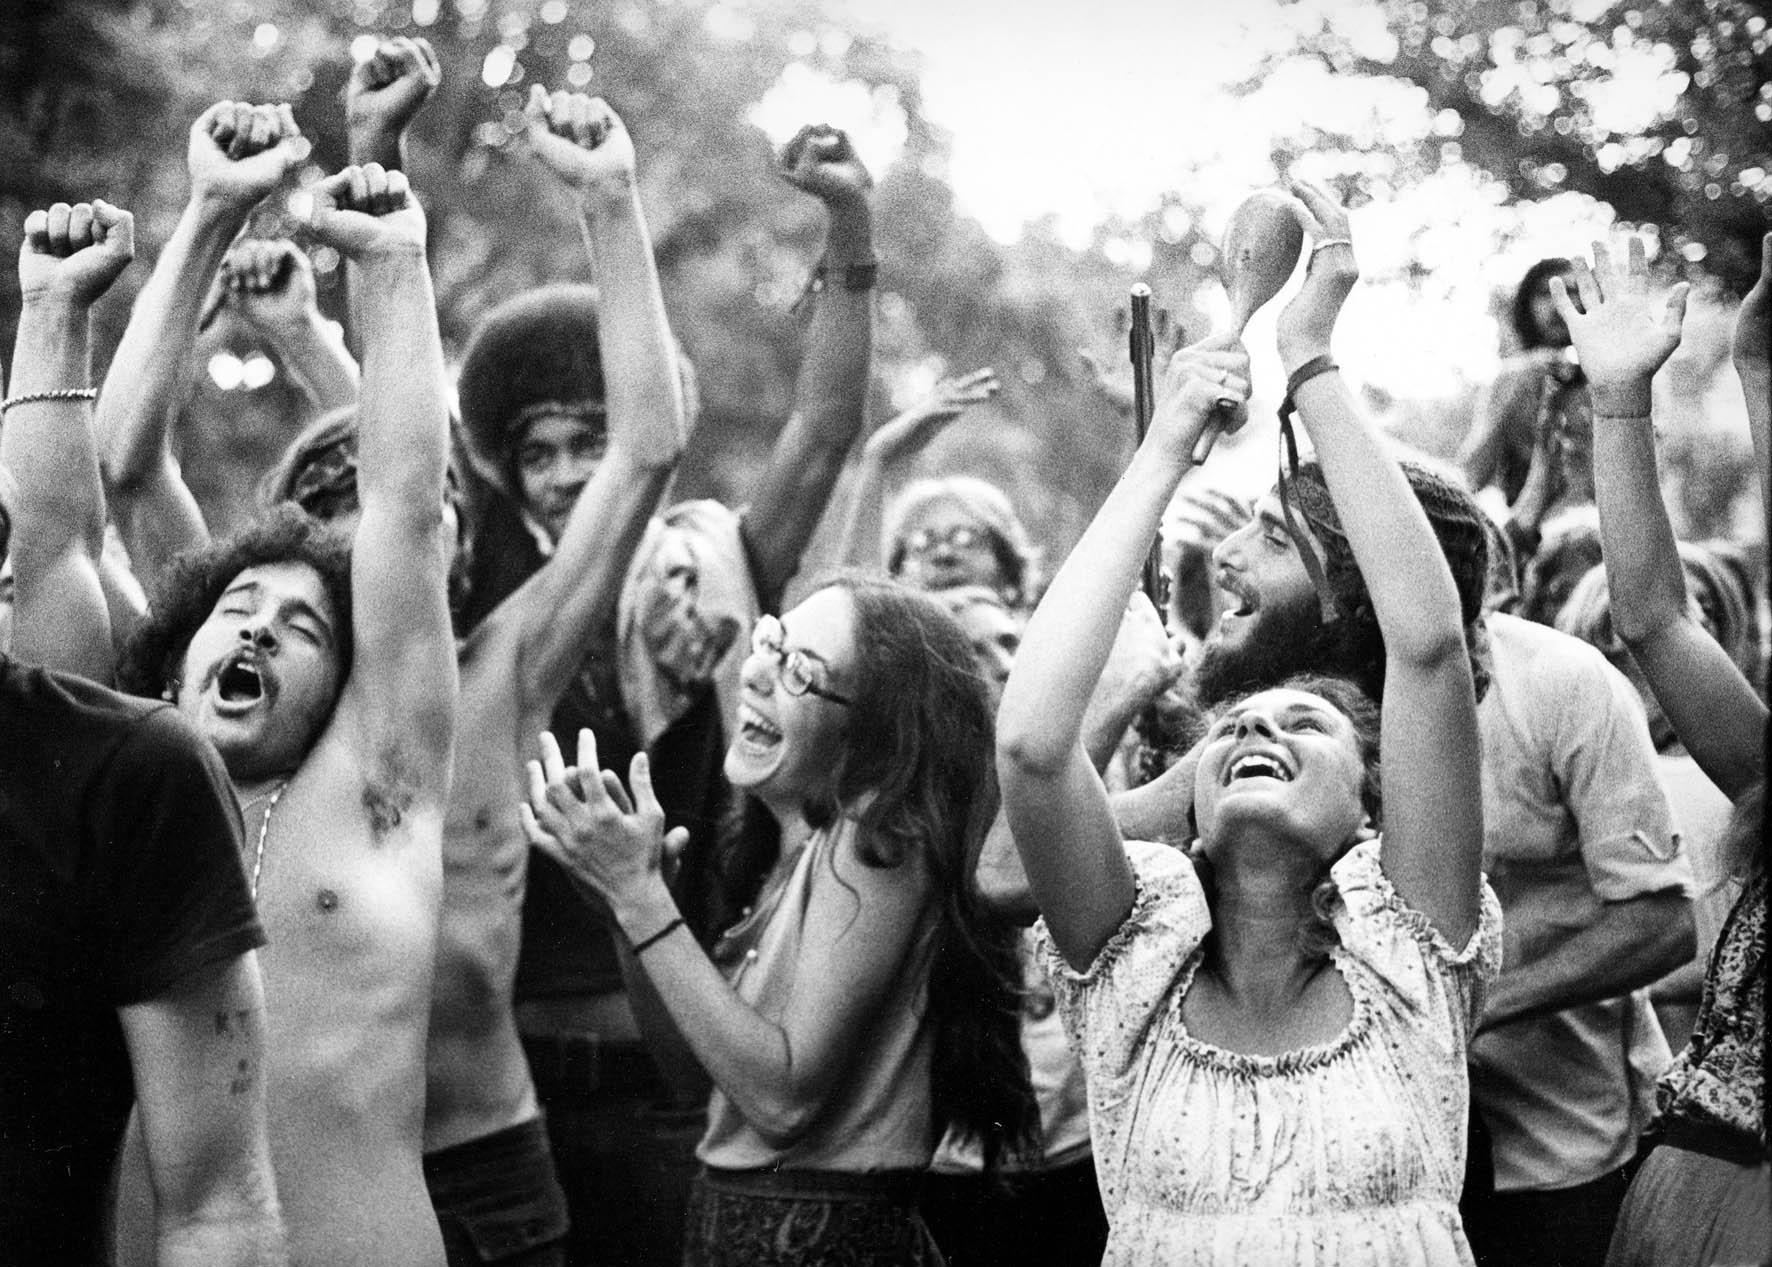 Holy man jam boulder co aug 1970